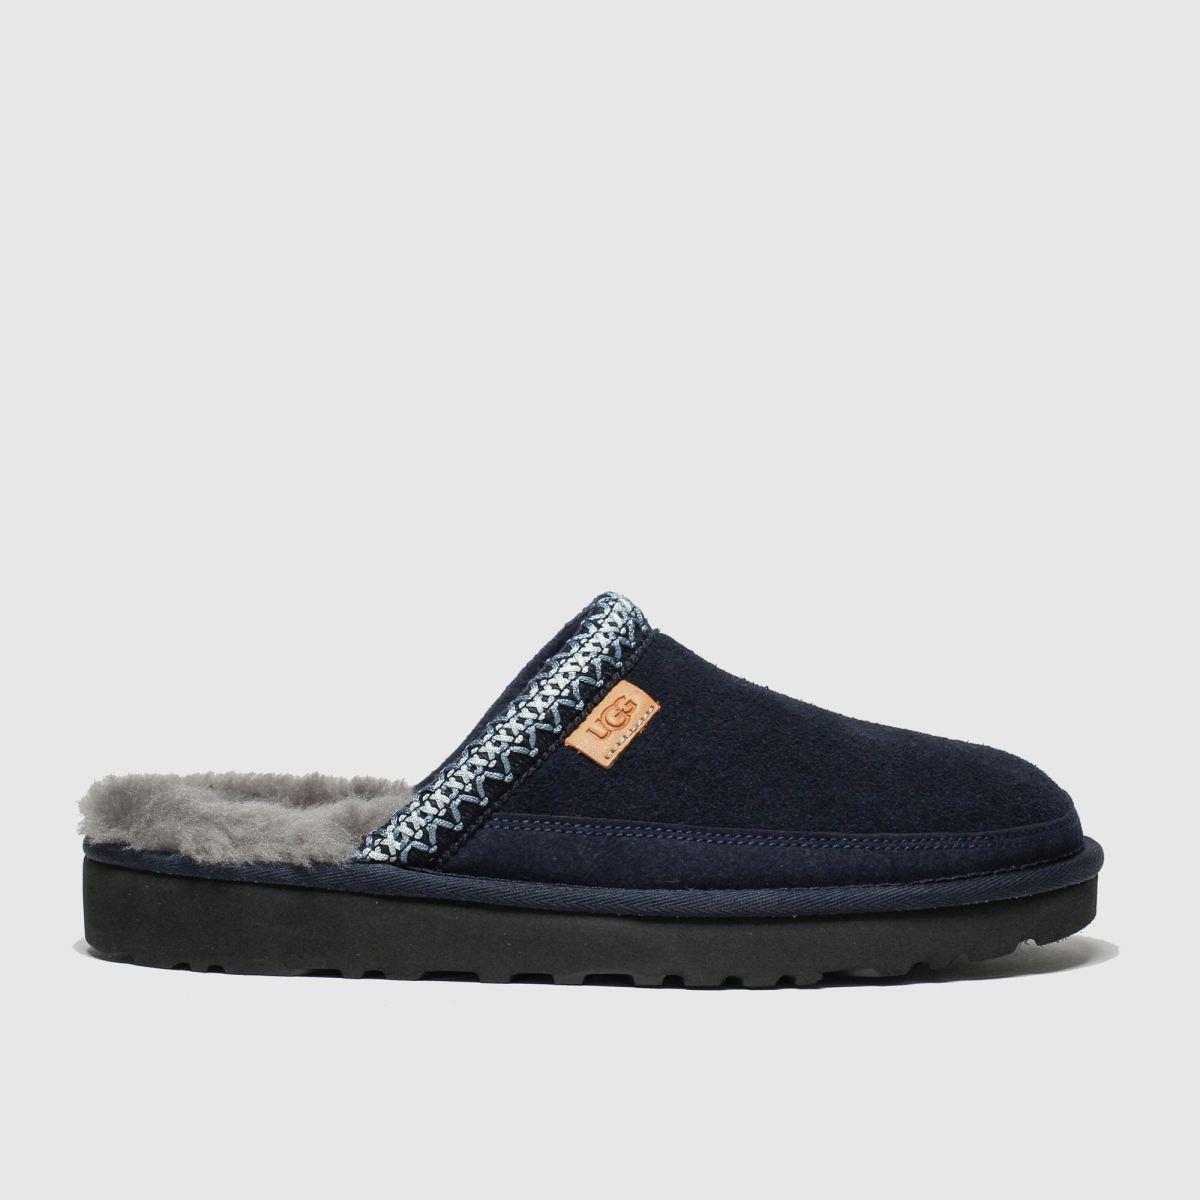 Ugg Navy Tasman Slip-on Slippers